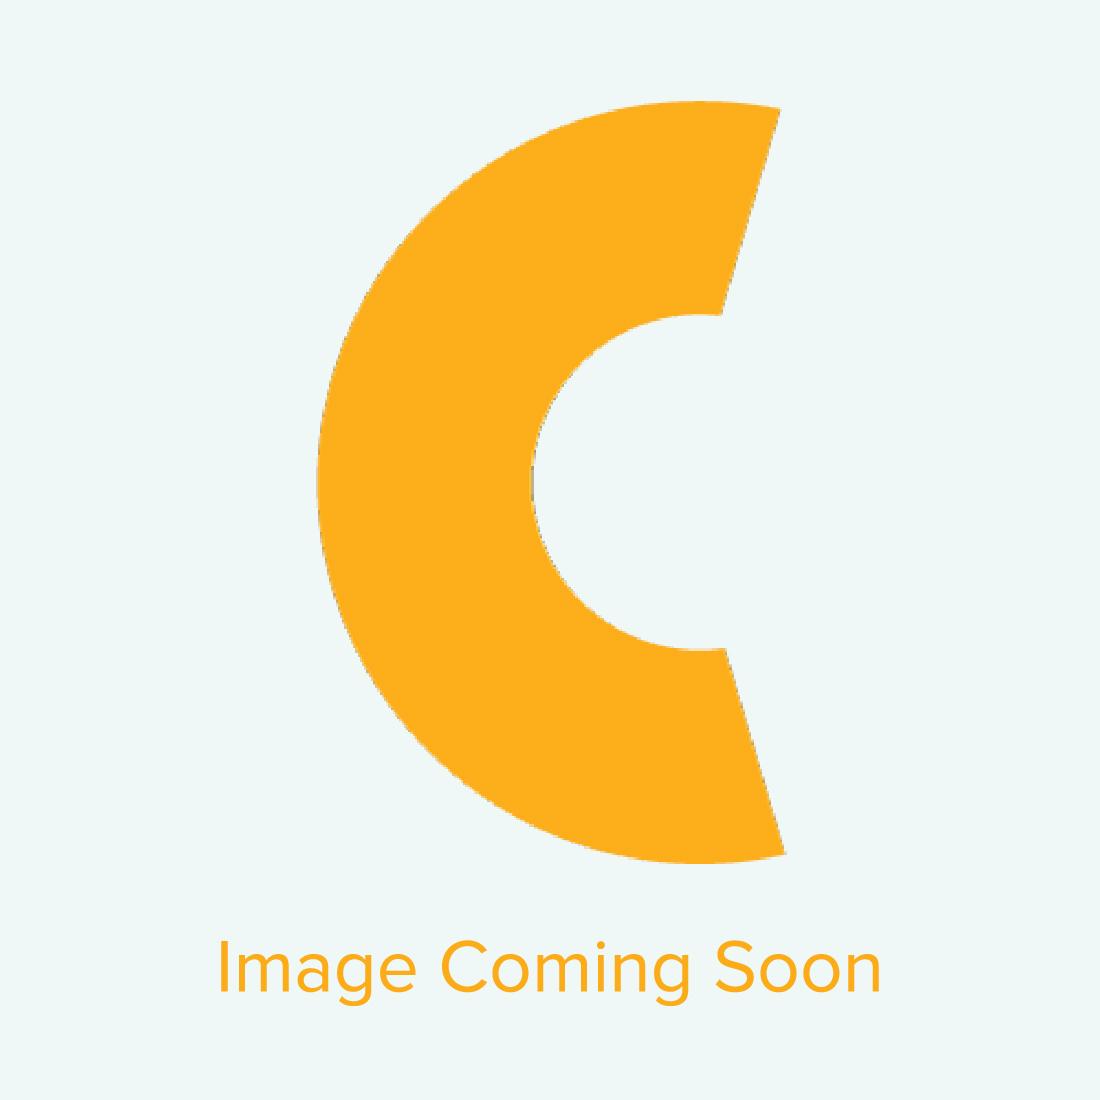 "TriSolv PrimeArt Paper – 200 gsm – 54"" x 165' - OVERSTOCK"